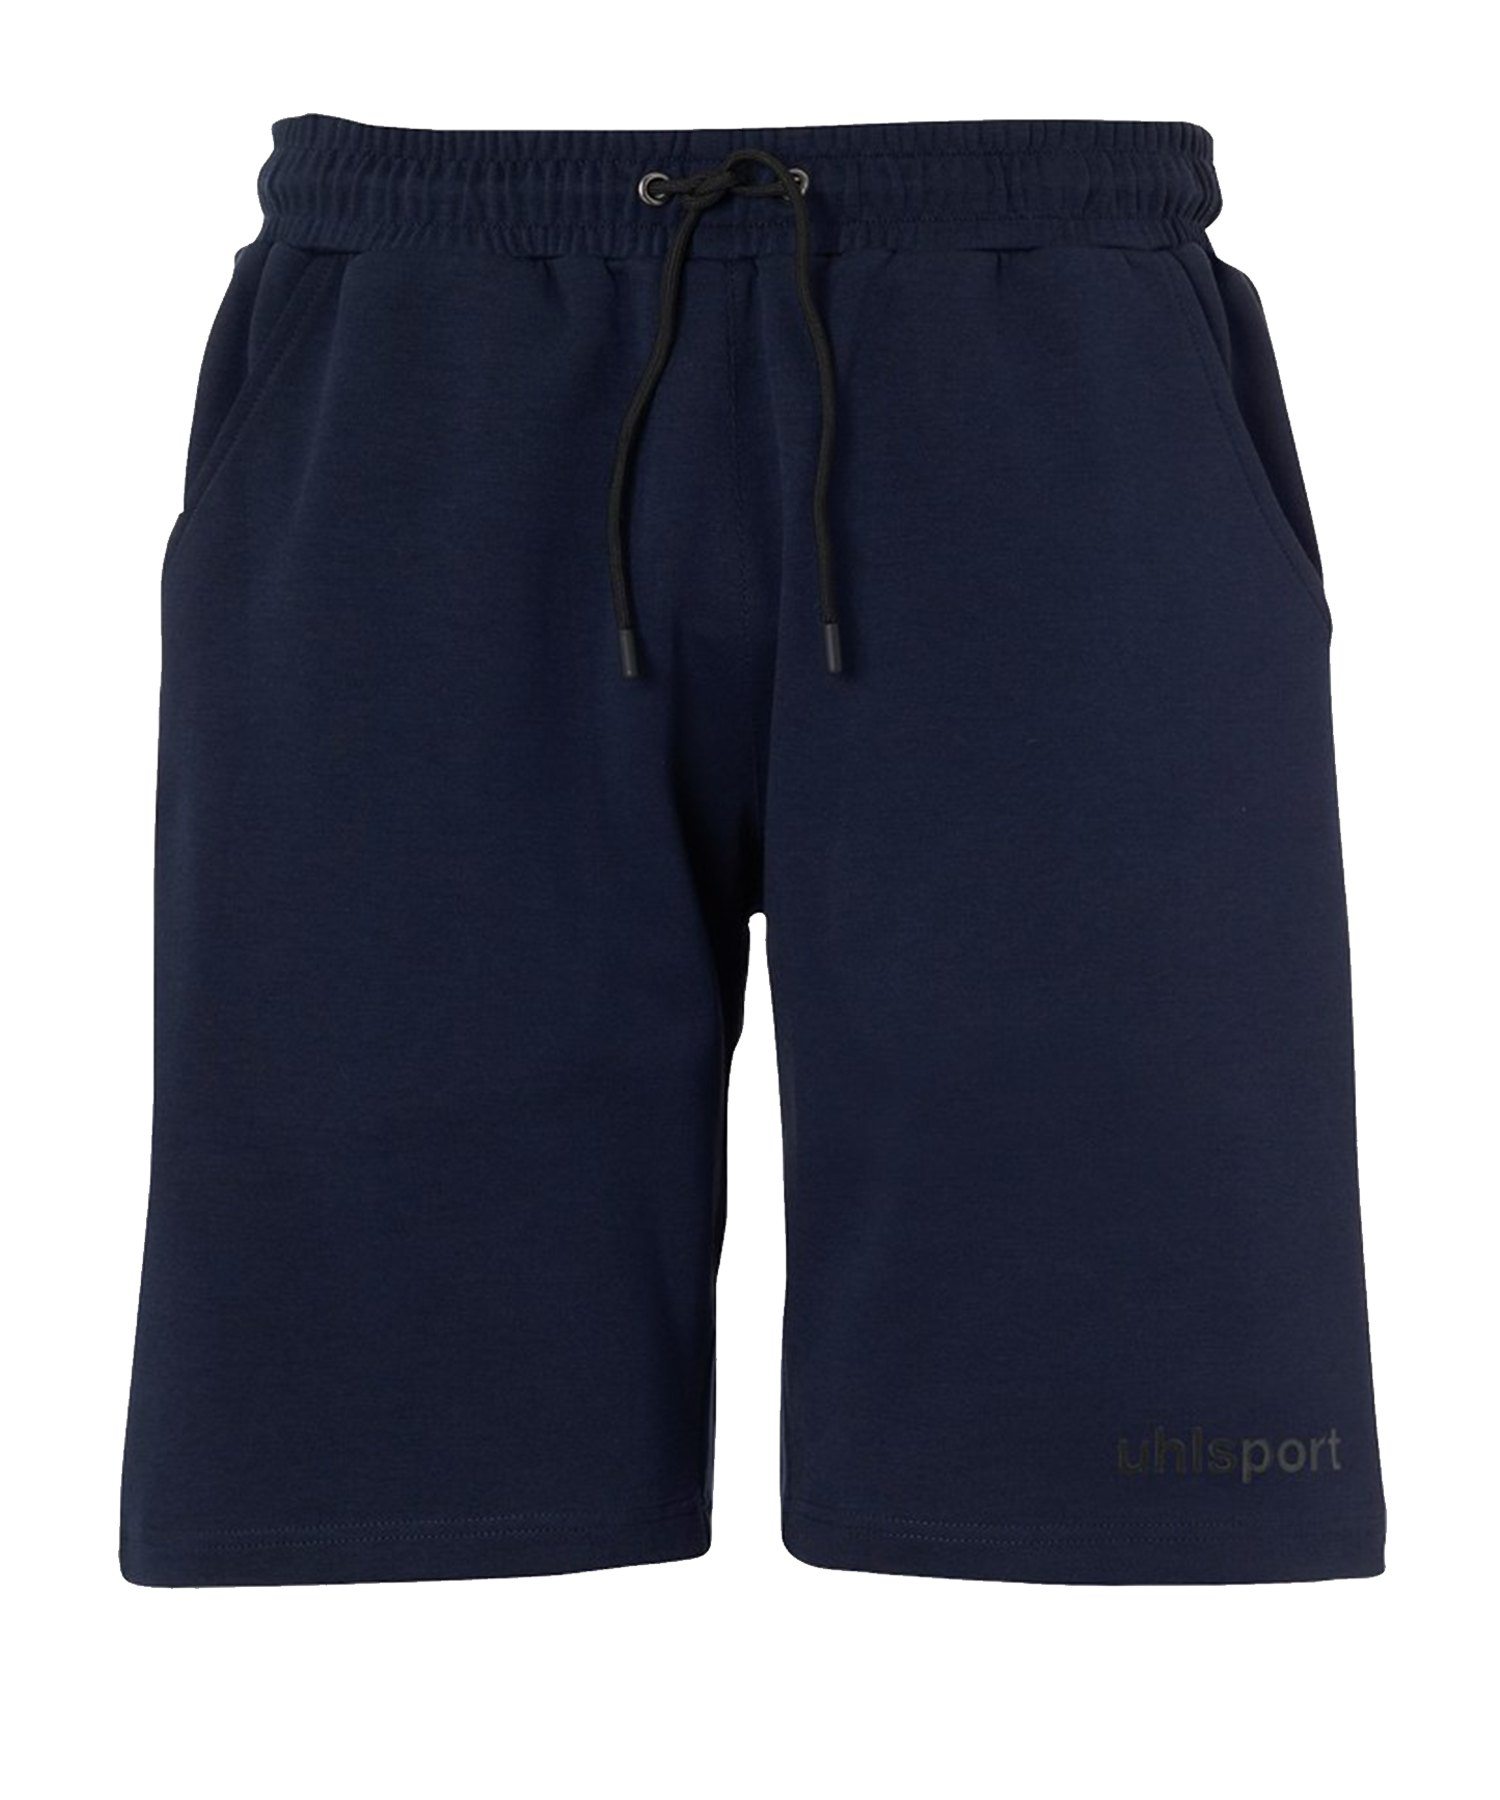 Uhlsport Essential Pro Short Hose kurz F12 - Blau